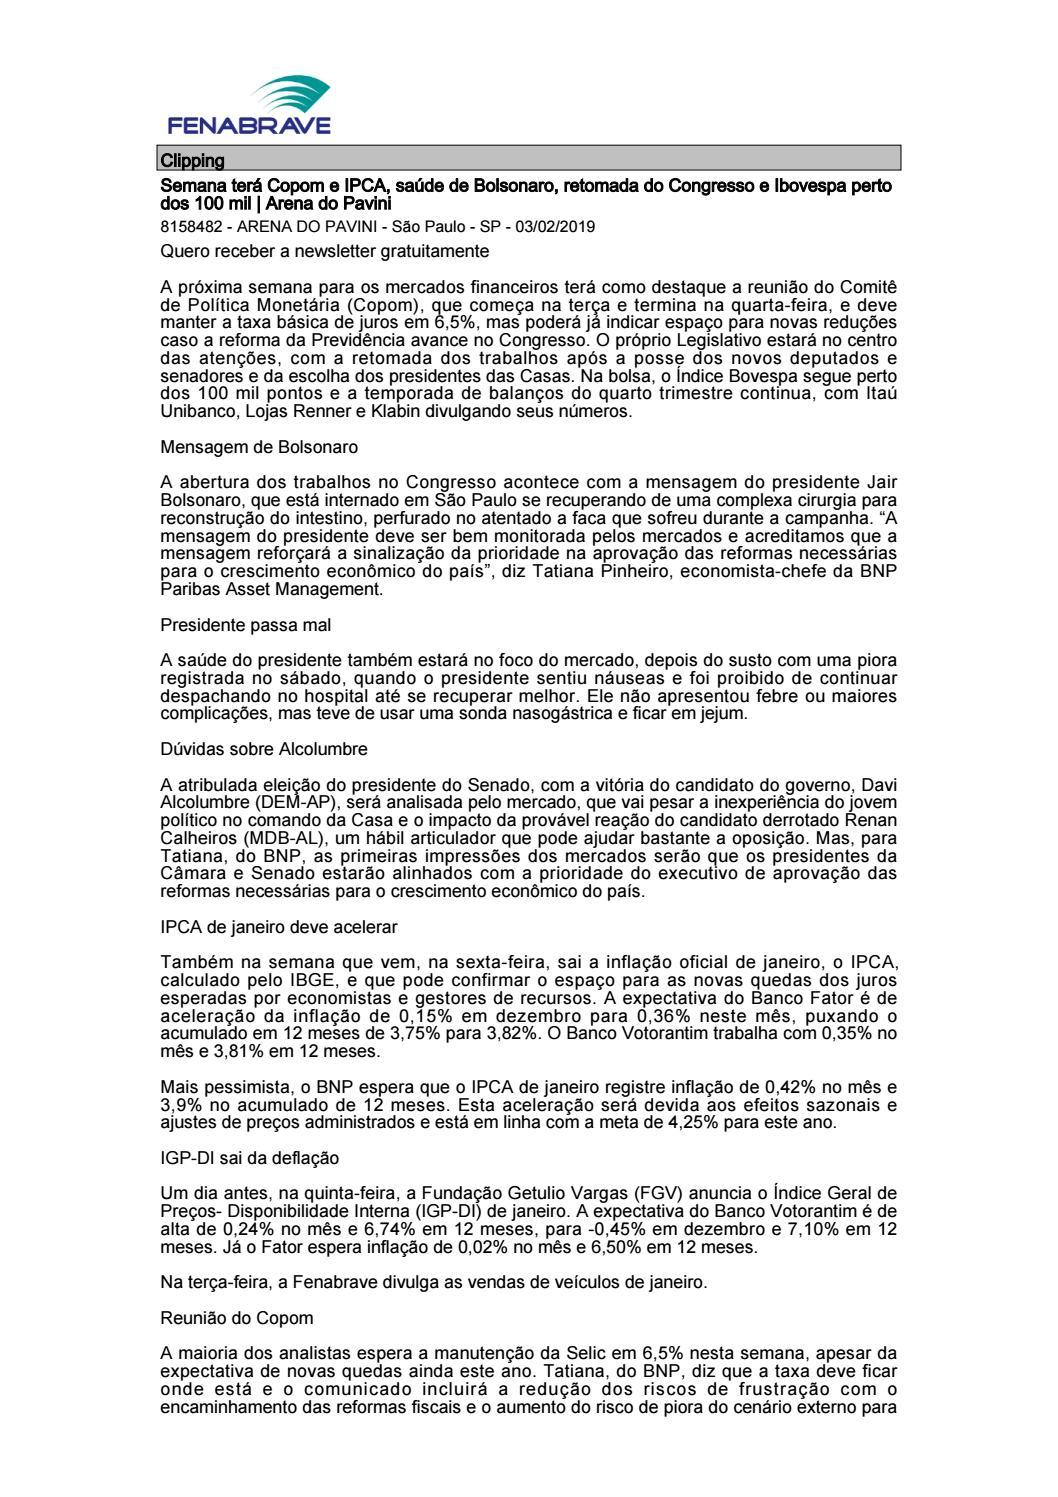 672f9f4f8153a Clipping Fenabrave - 04 02 2019 by MCE Comunicação - issuu